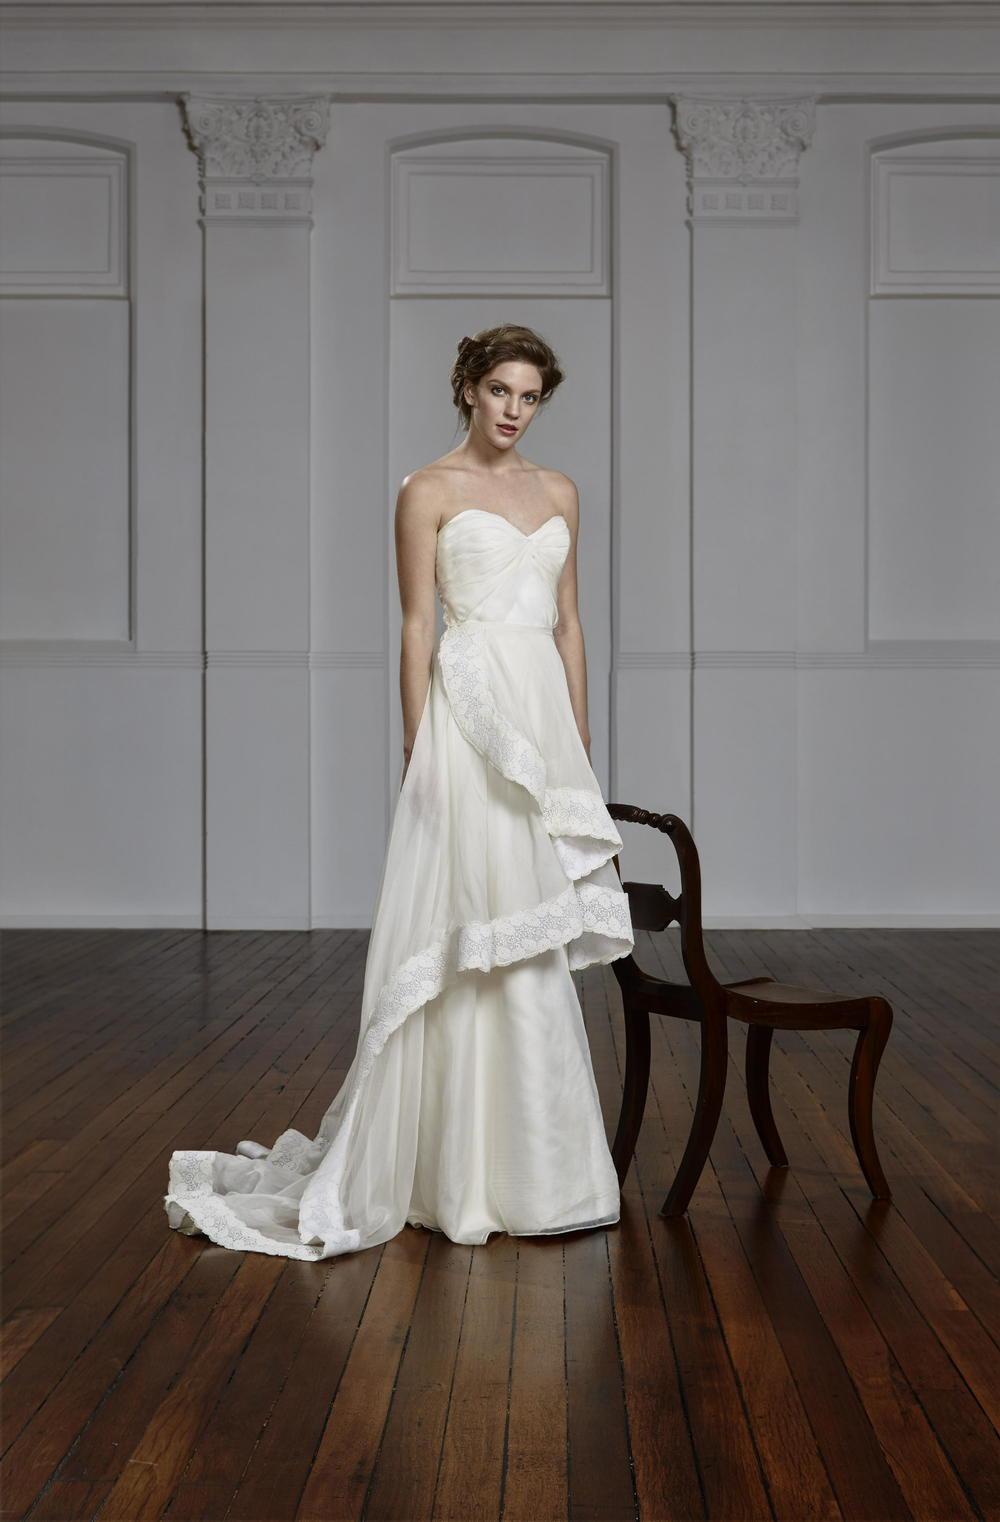 Fern-bridal design_TanyaAnic©GrantSparkesCarroll_204 a.jpg